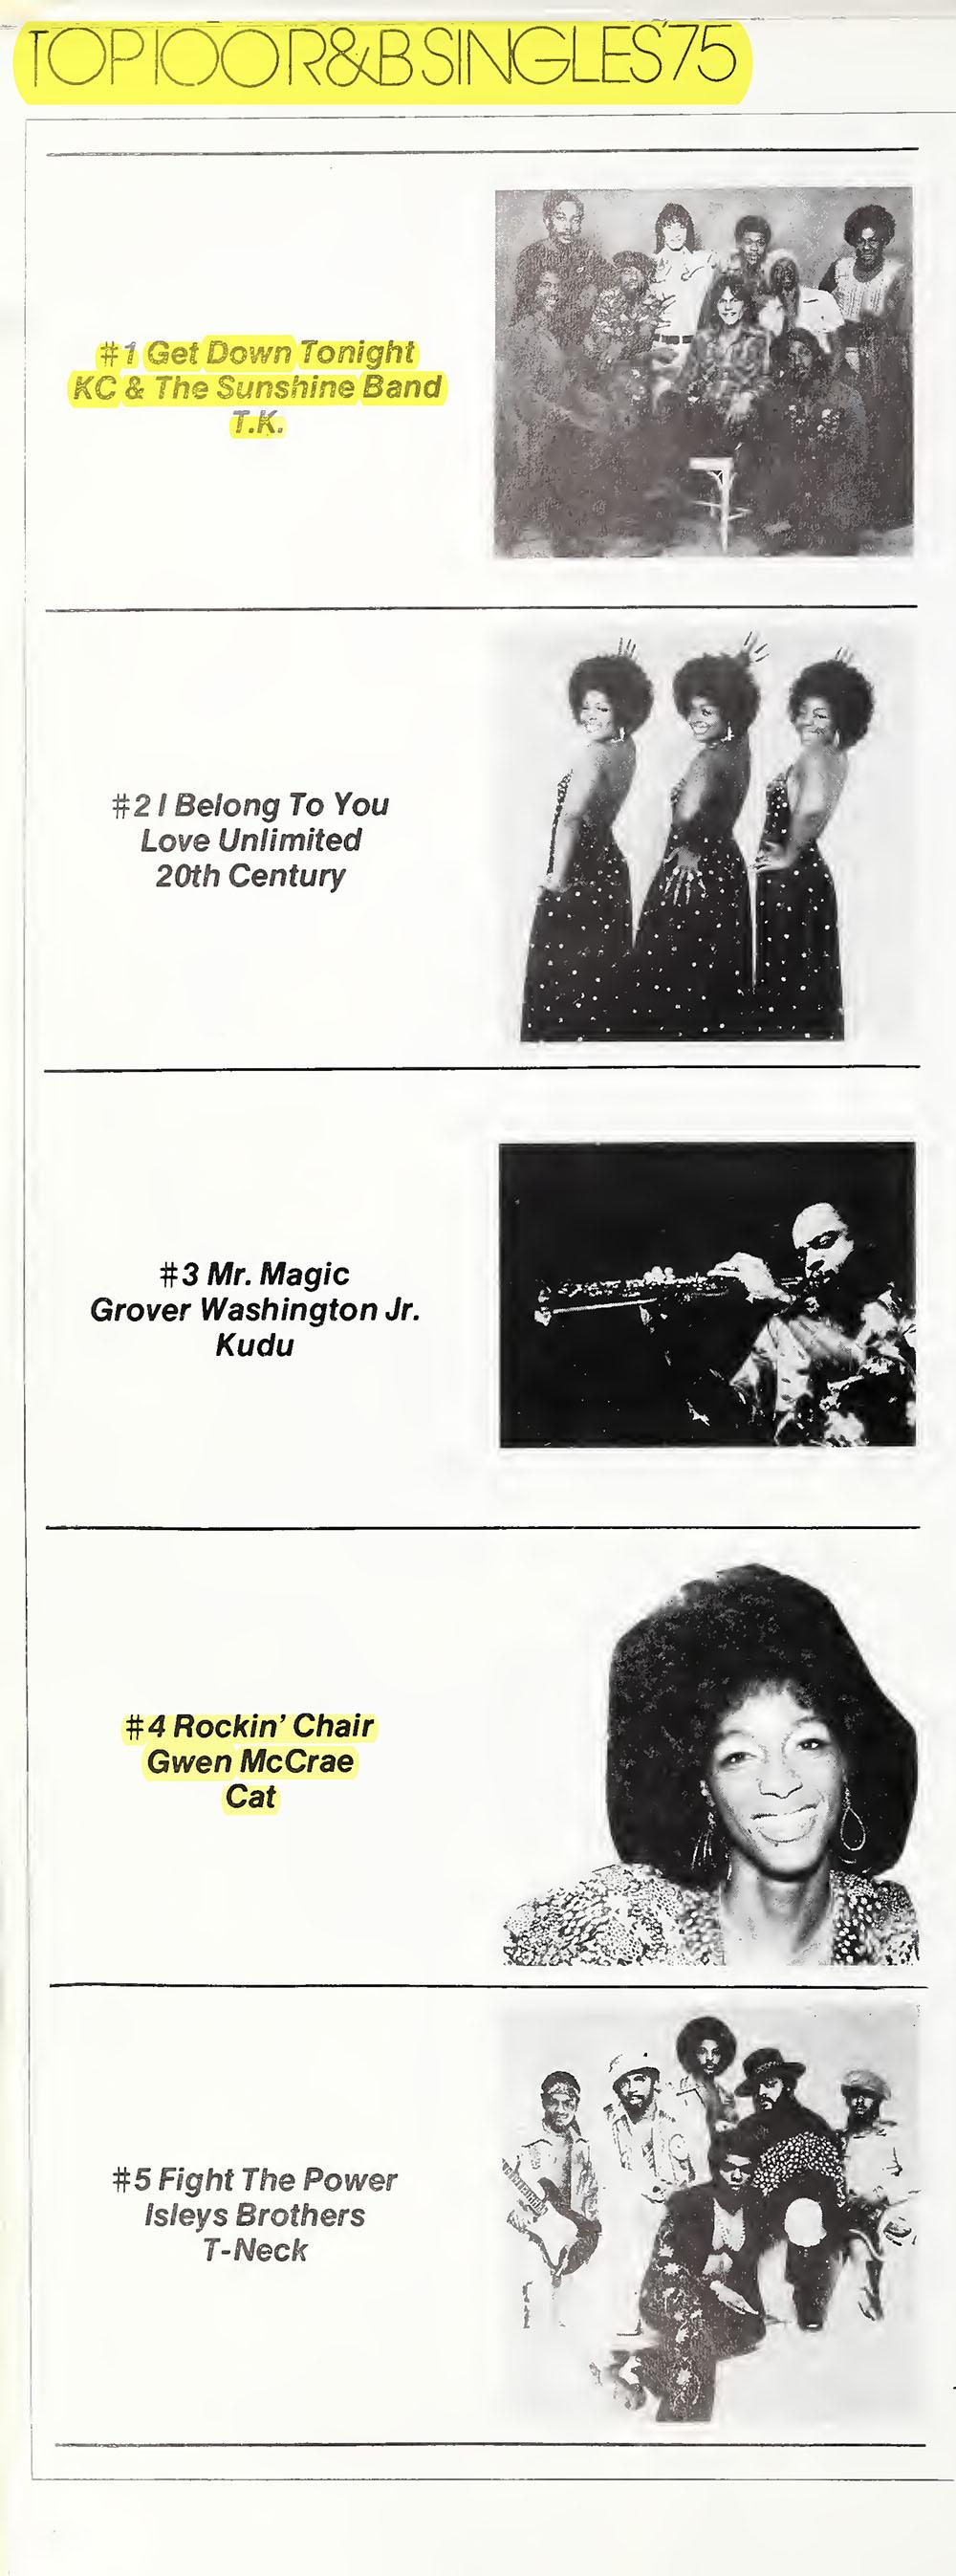 Top 5 R&B Singles of 1975